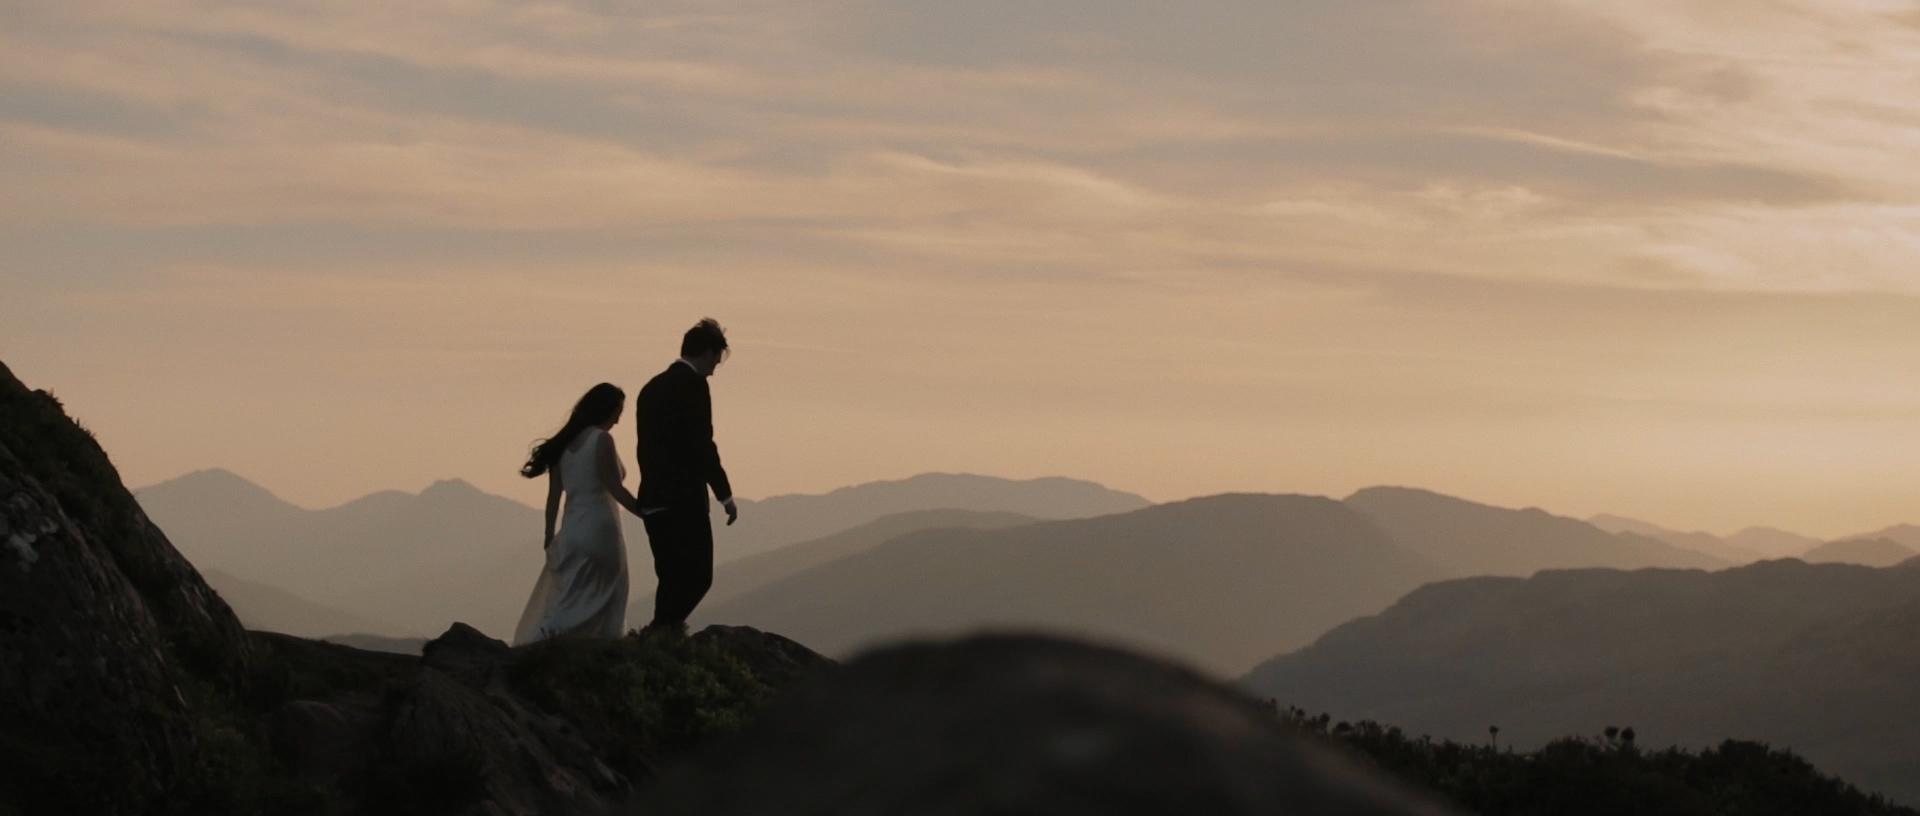 perth-wedding-videographer_LL_01.jpg